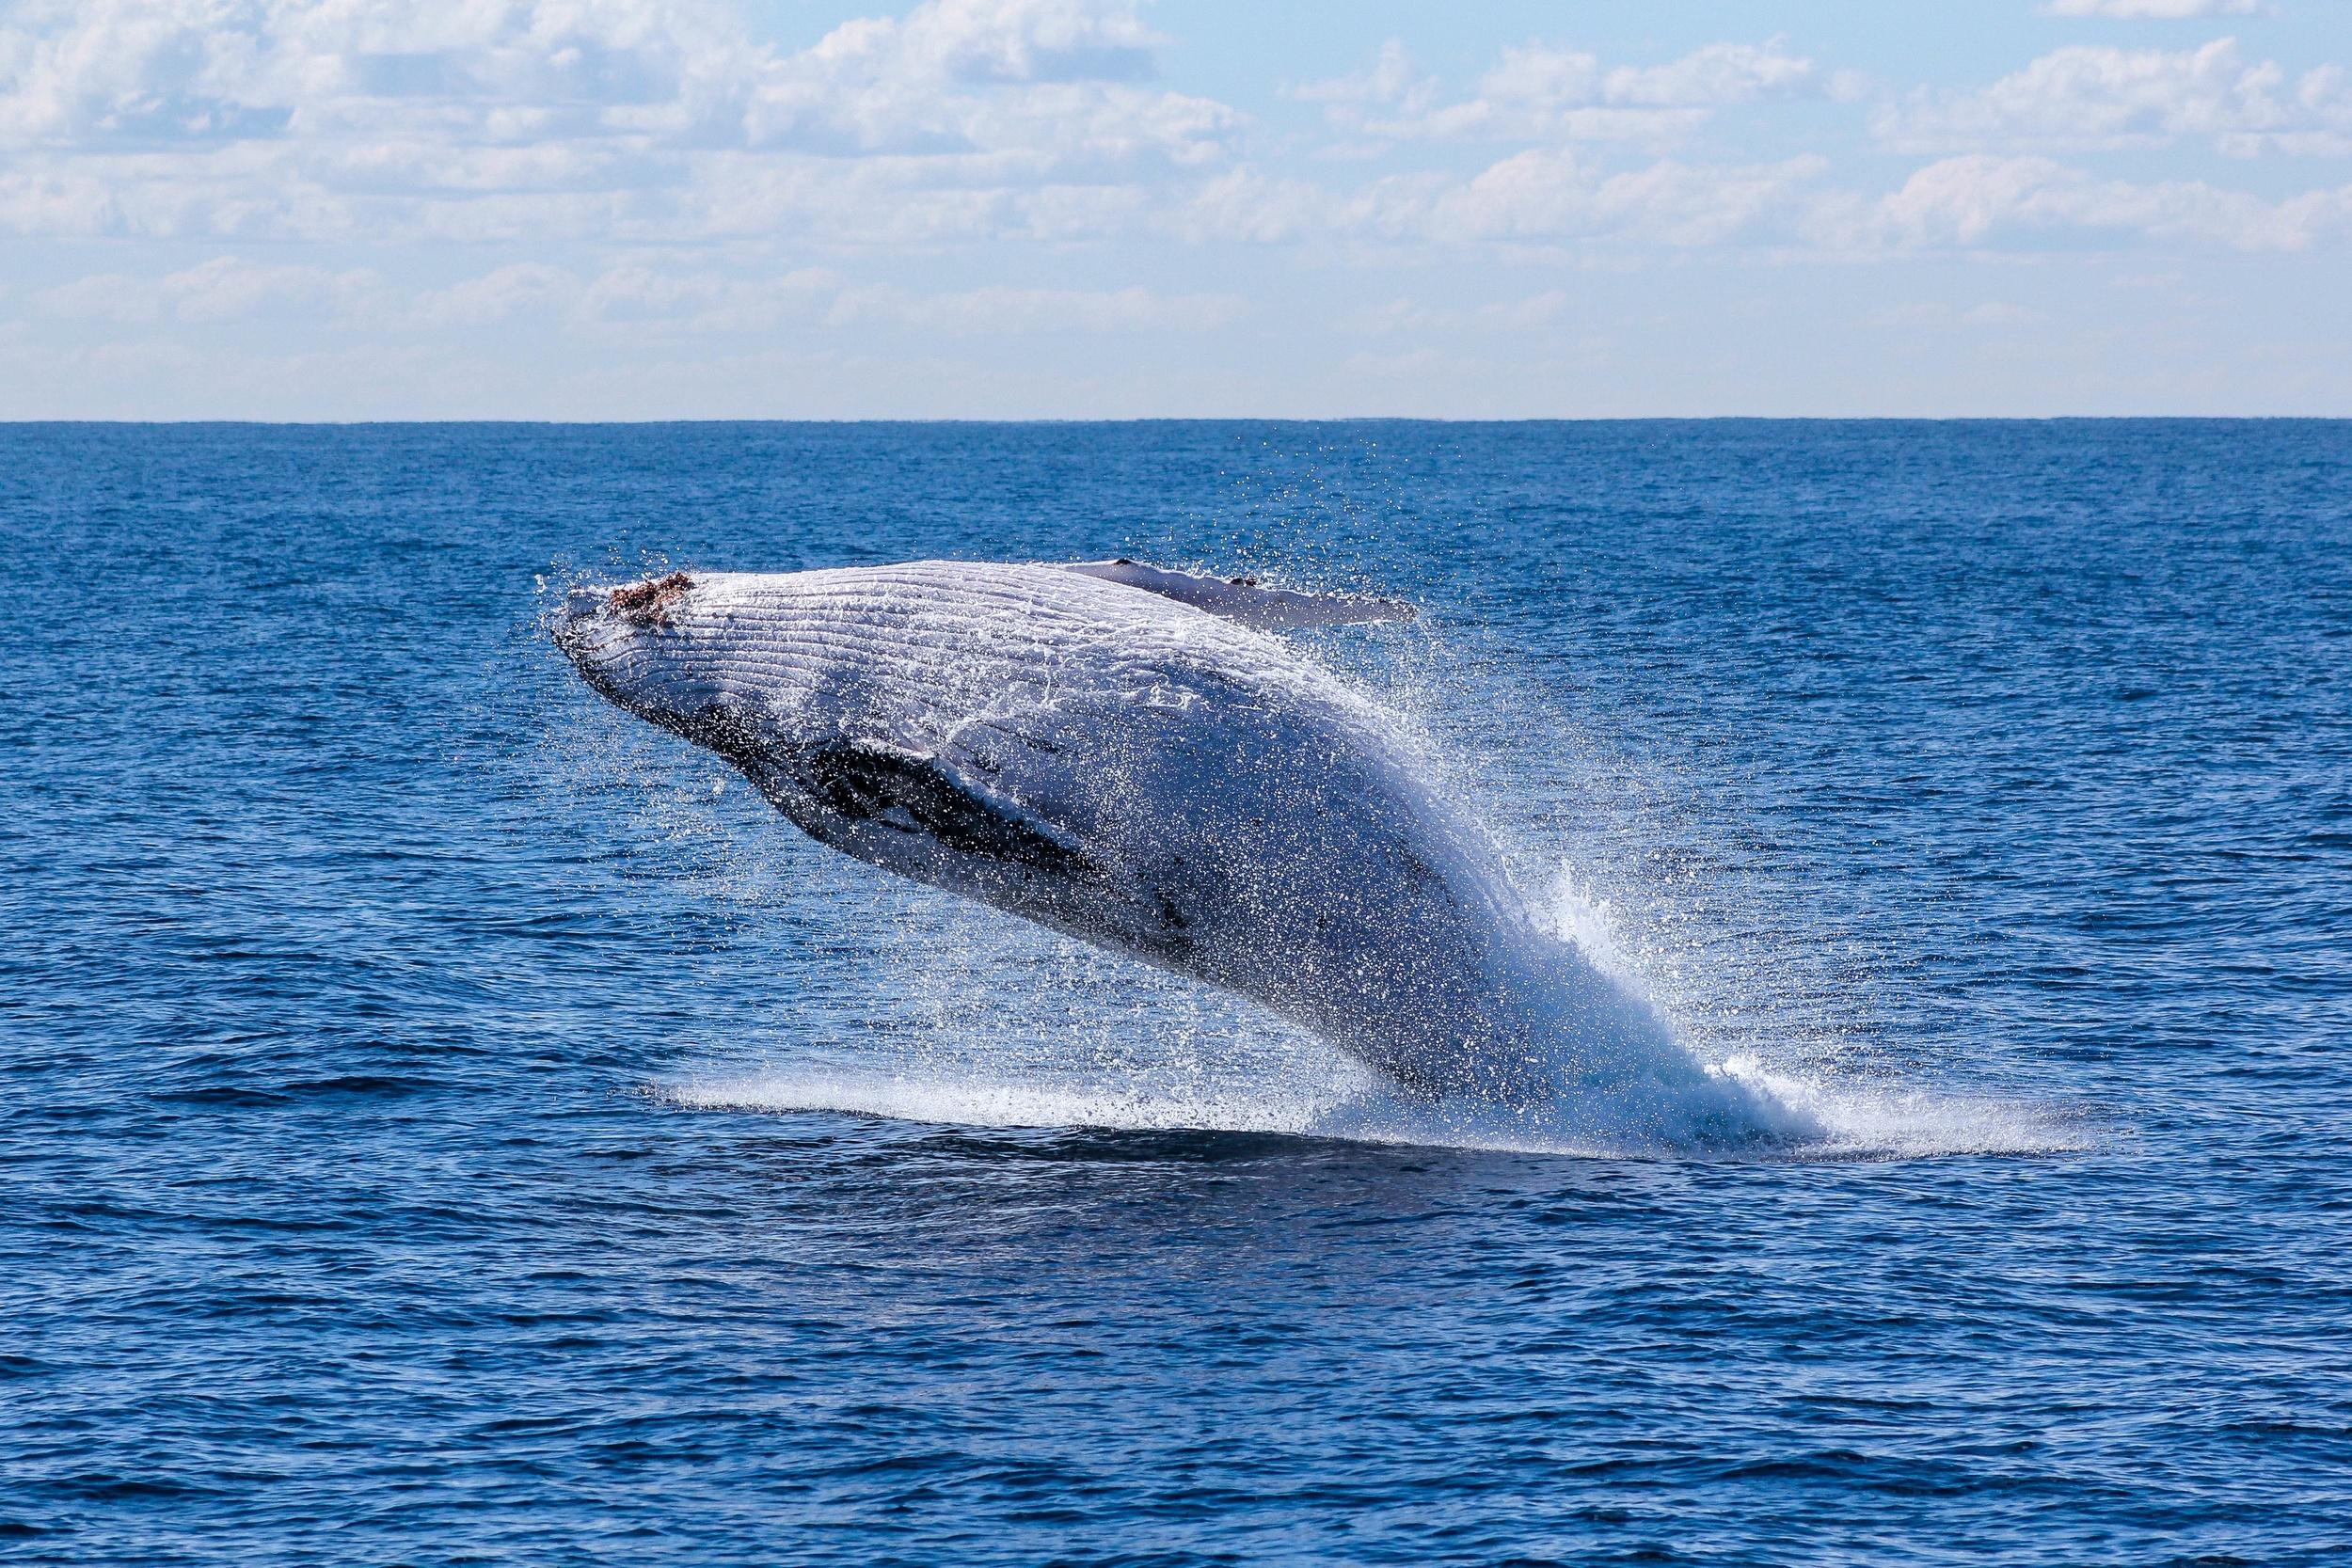 Whale season in Australia